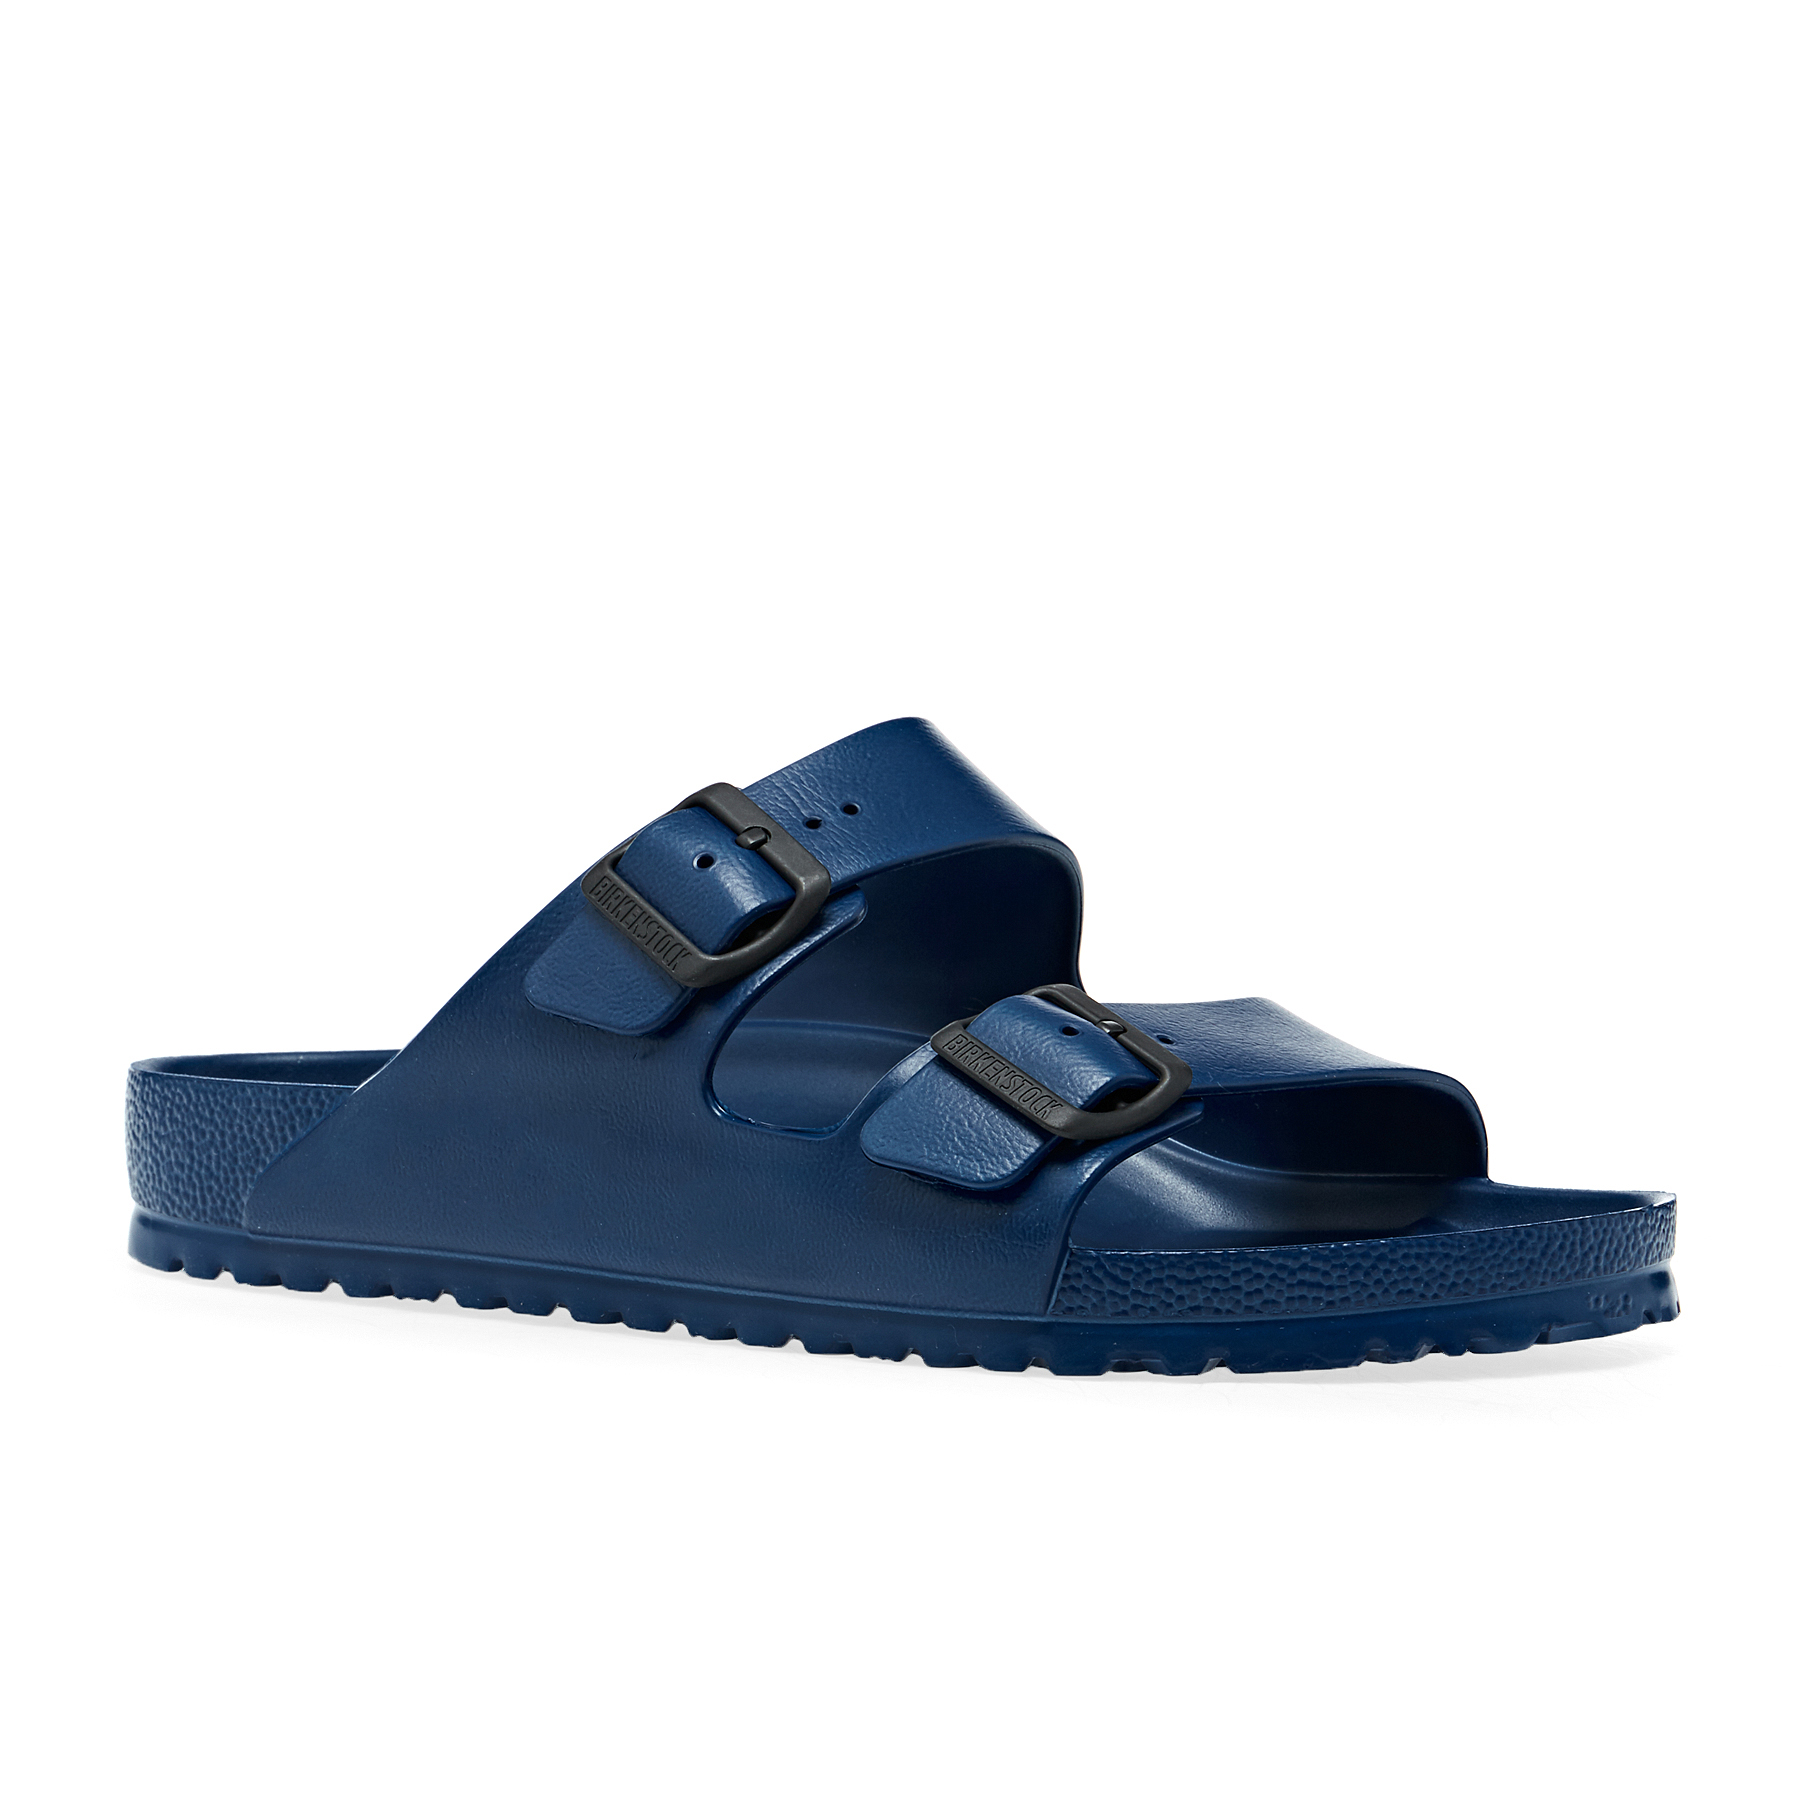 Birkenstock Kairo Aeschbach Chaussures